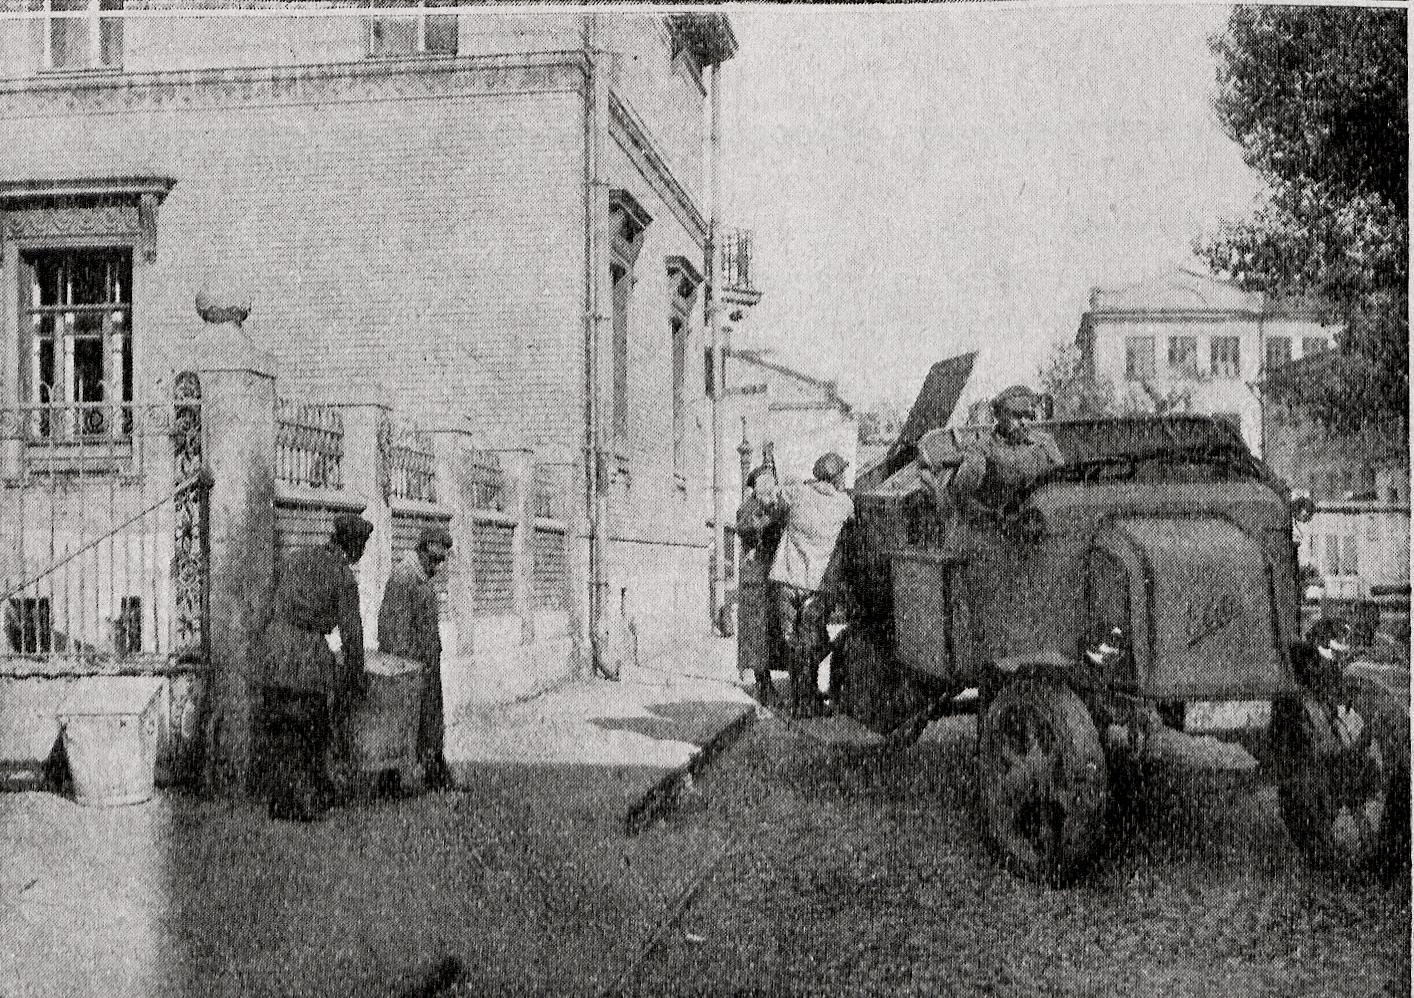 1926 Электровоз, убирающий мусор